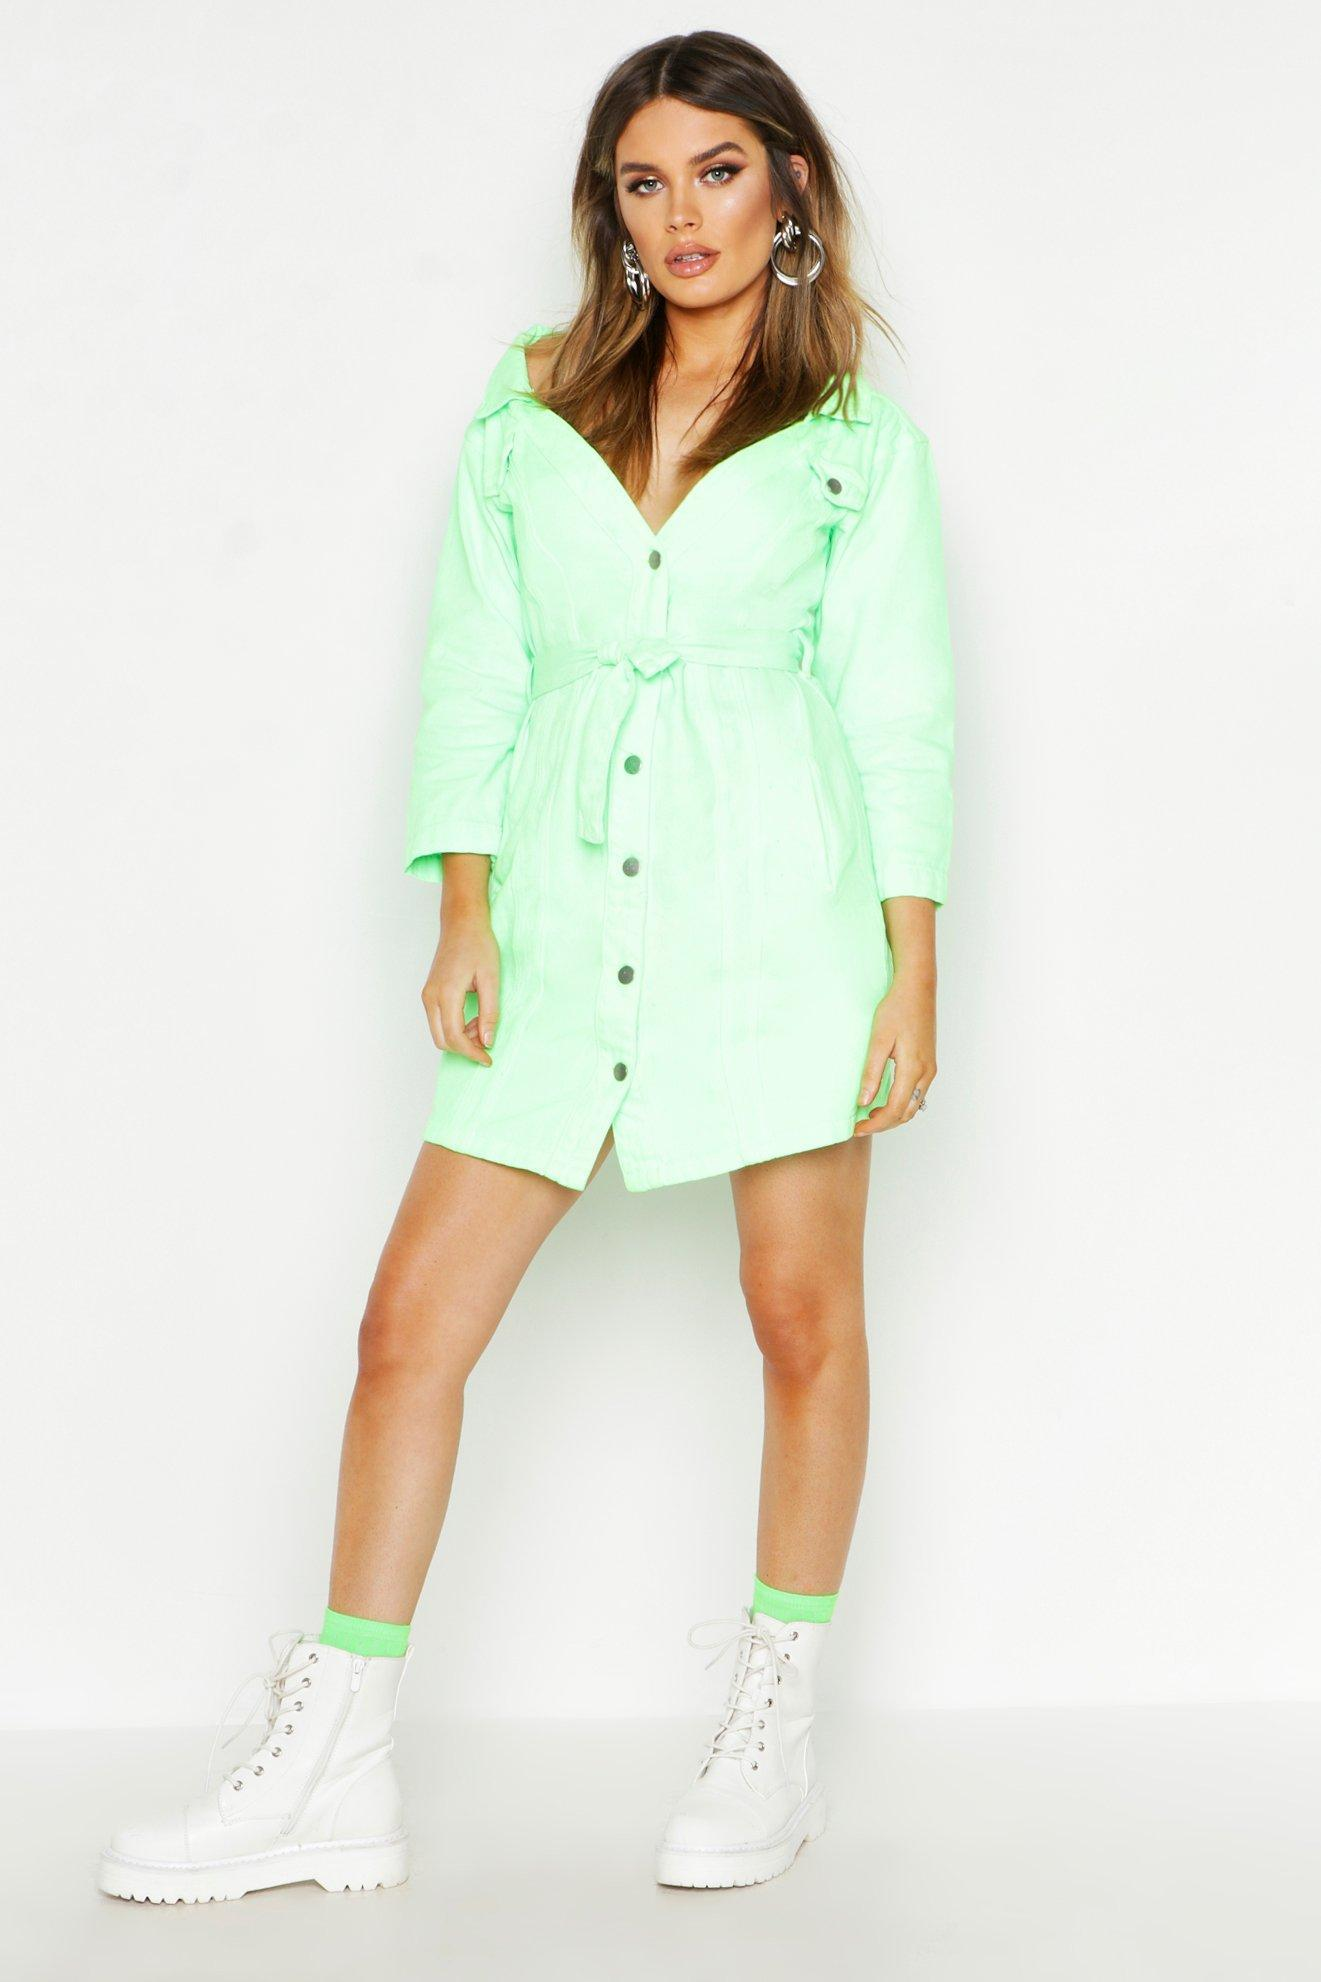 c8a1769cfb Lyst - Boohoo Neon Off The Shoulder Denim Dress in Green